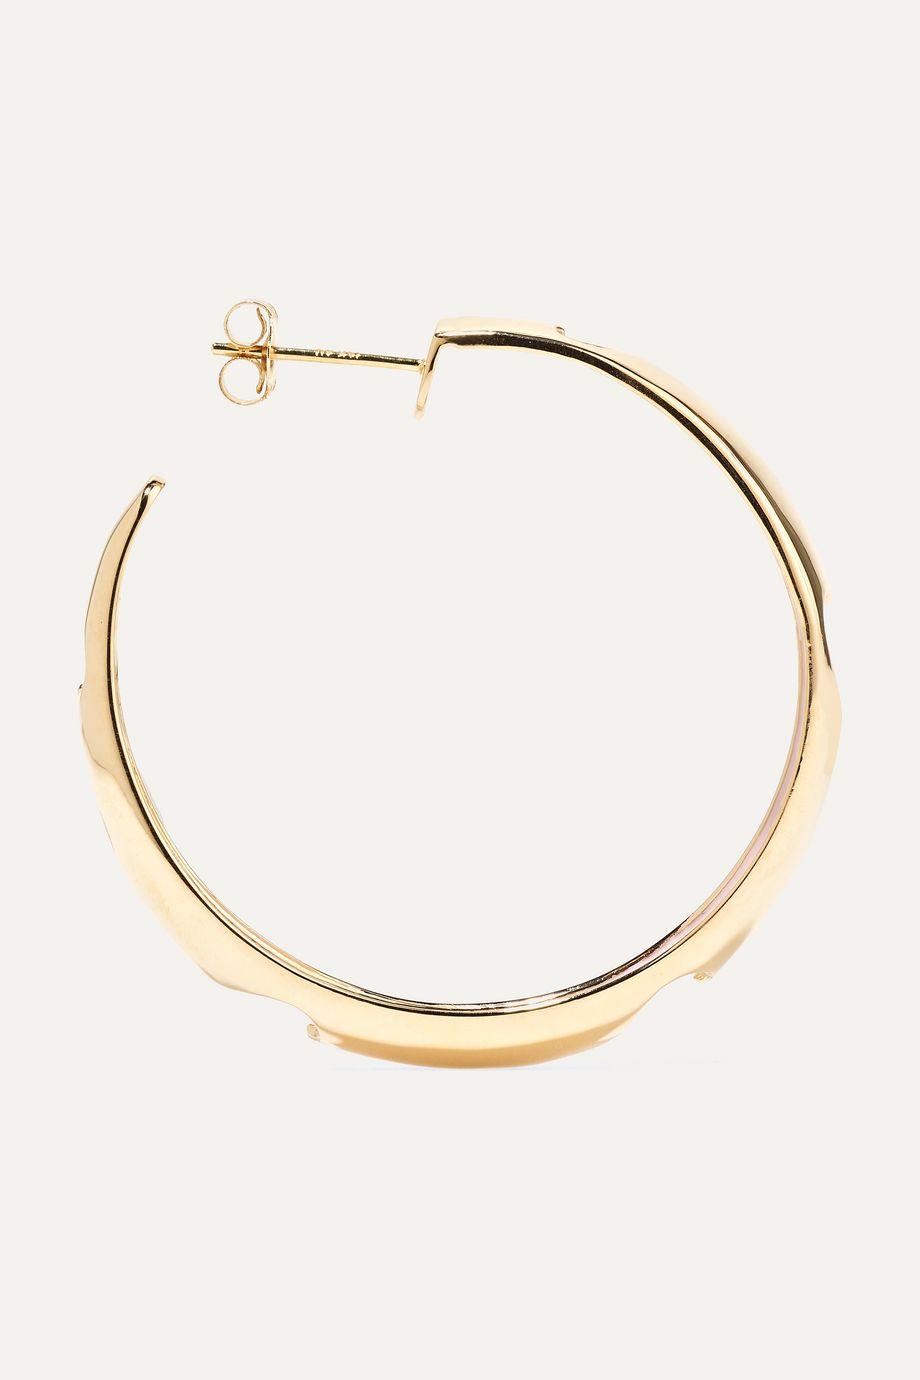 Alison Lou Heart 14-karat gold and enamel hoop earrings